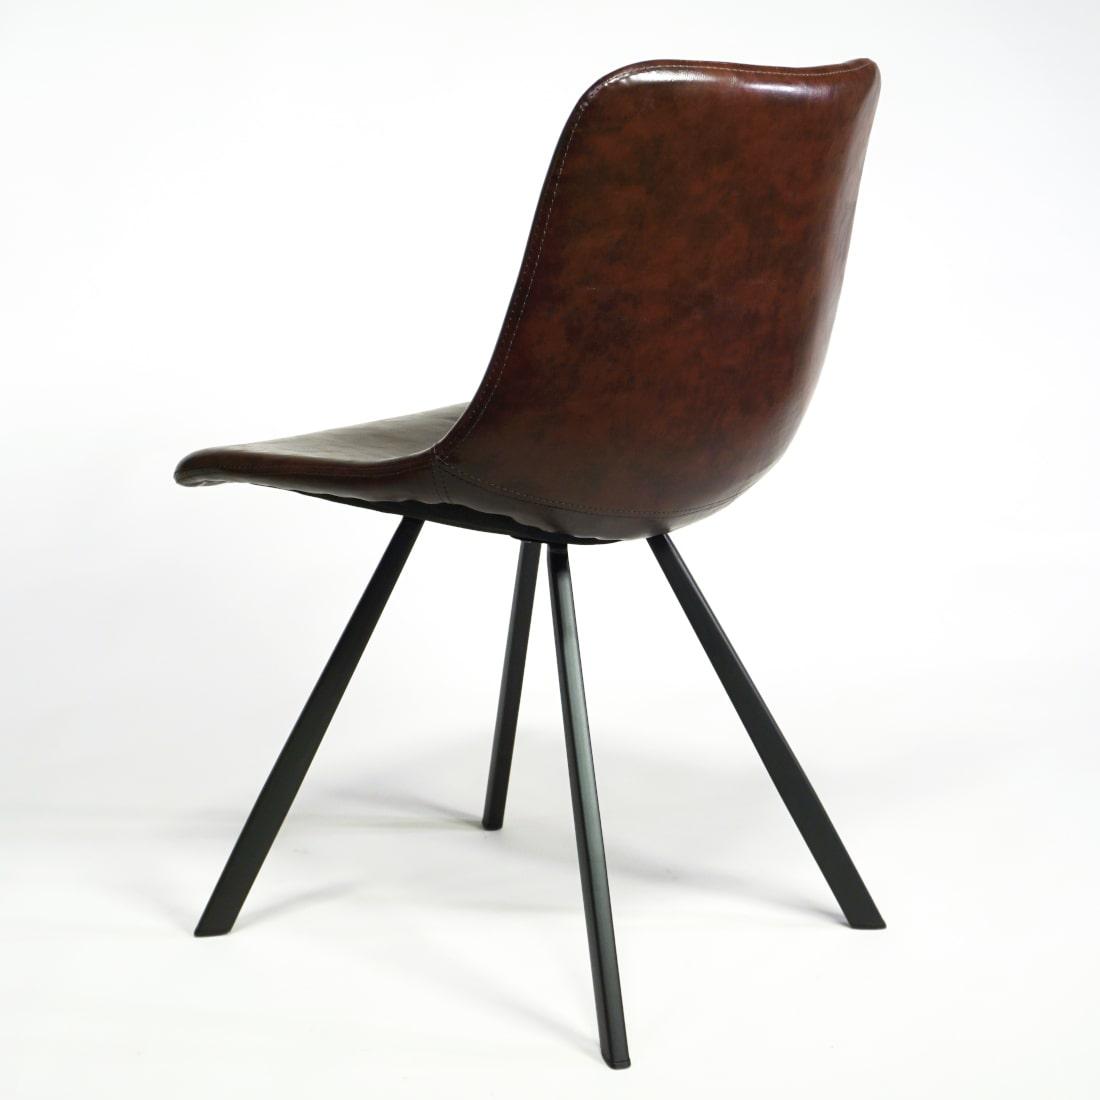 Esszimmerstuhl retro vintage Design